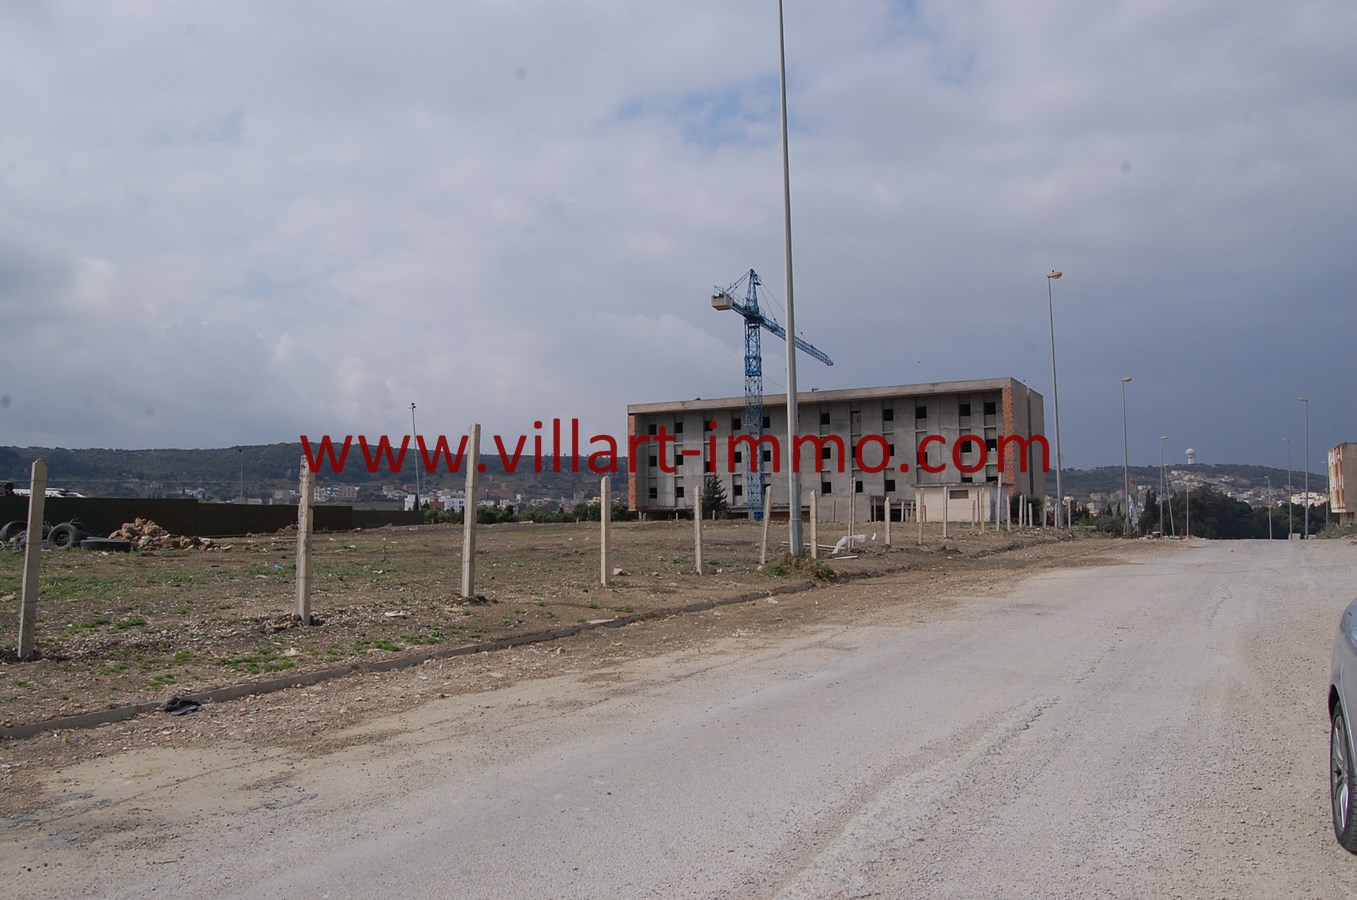 6-Vente-Terrain-Tanger-Gzenaya-VT27-Villart Immo